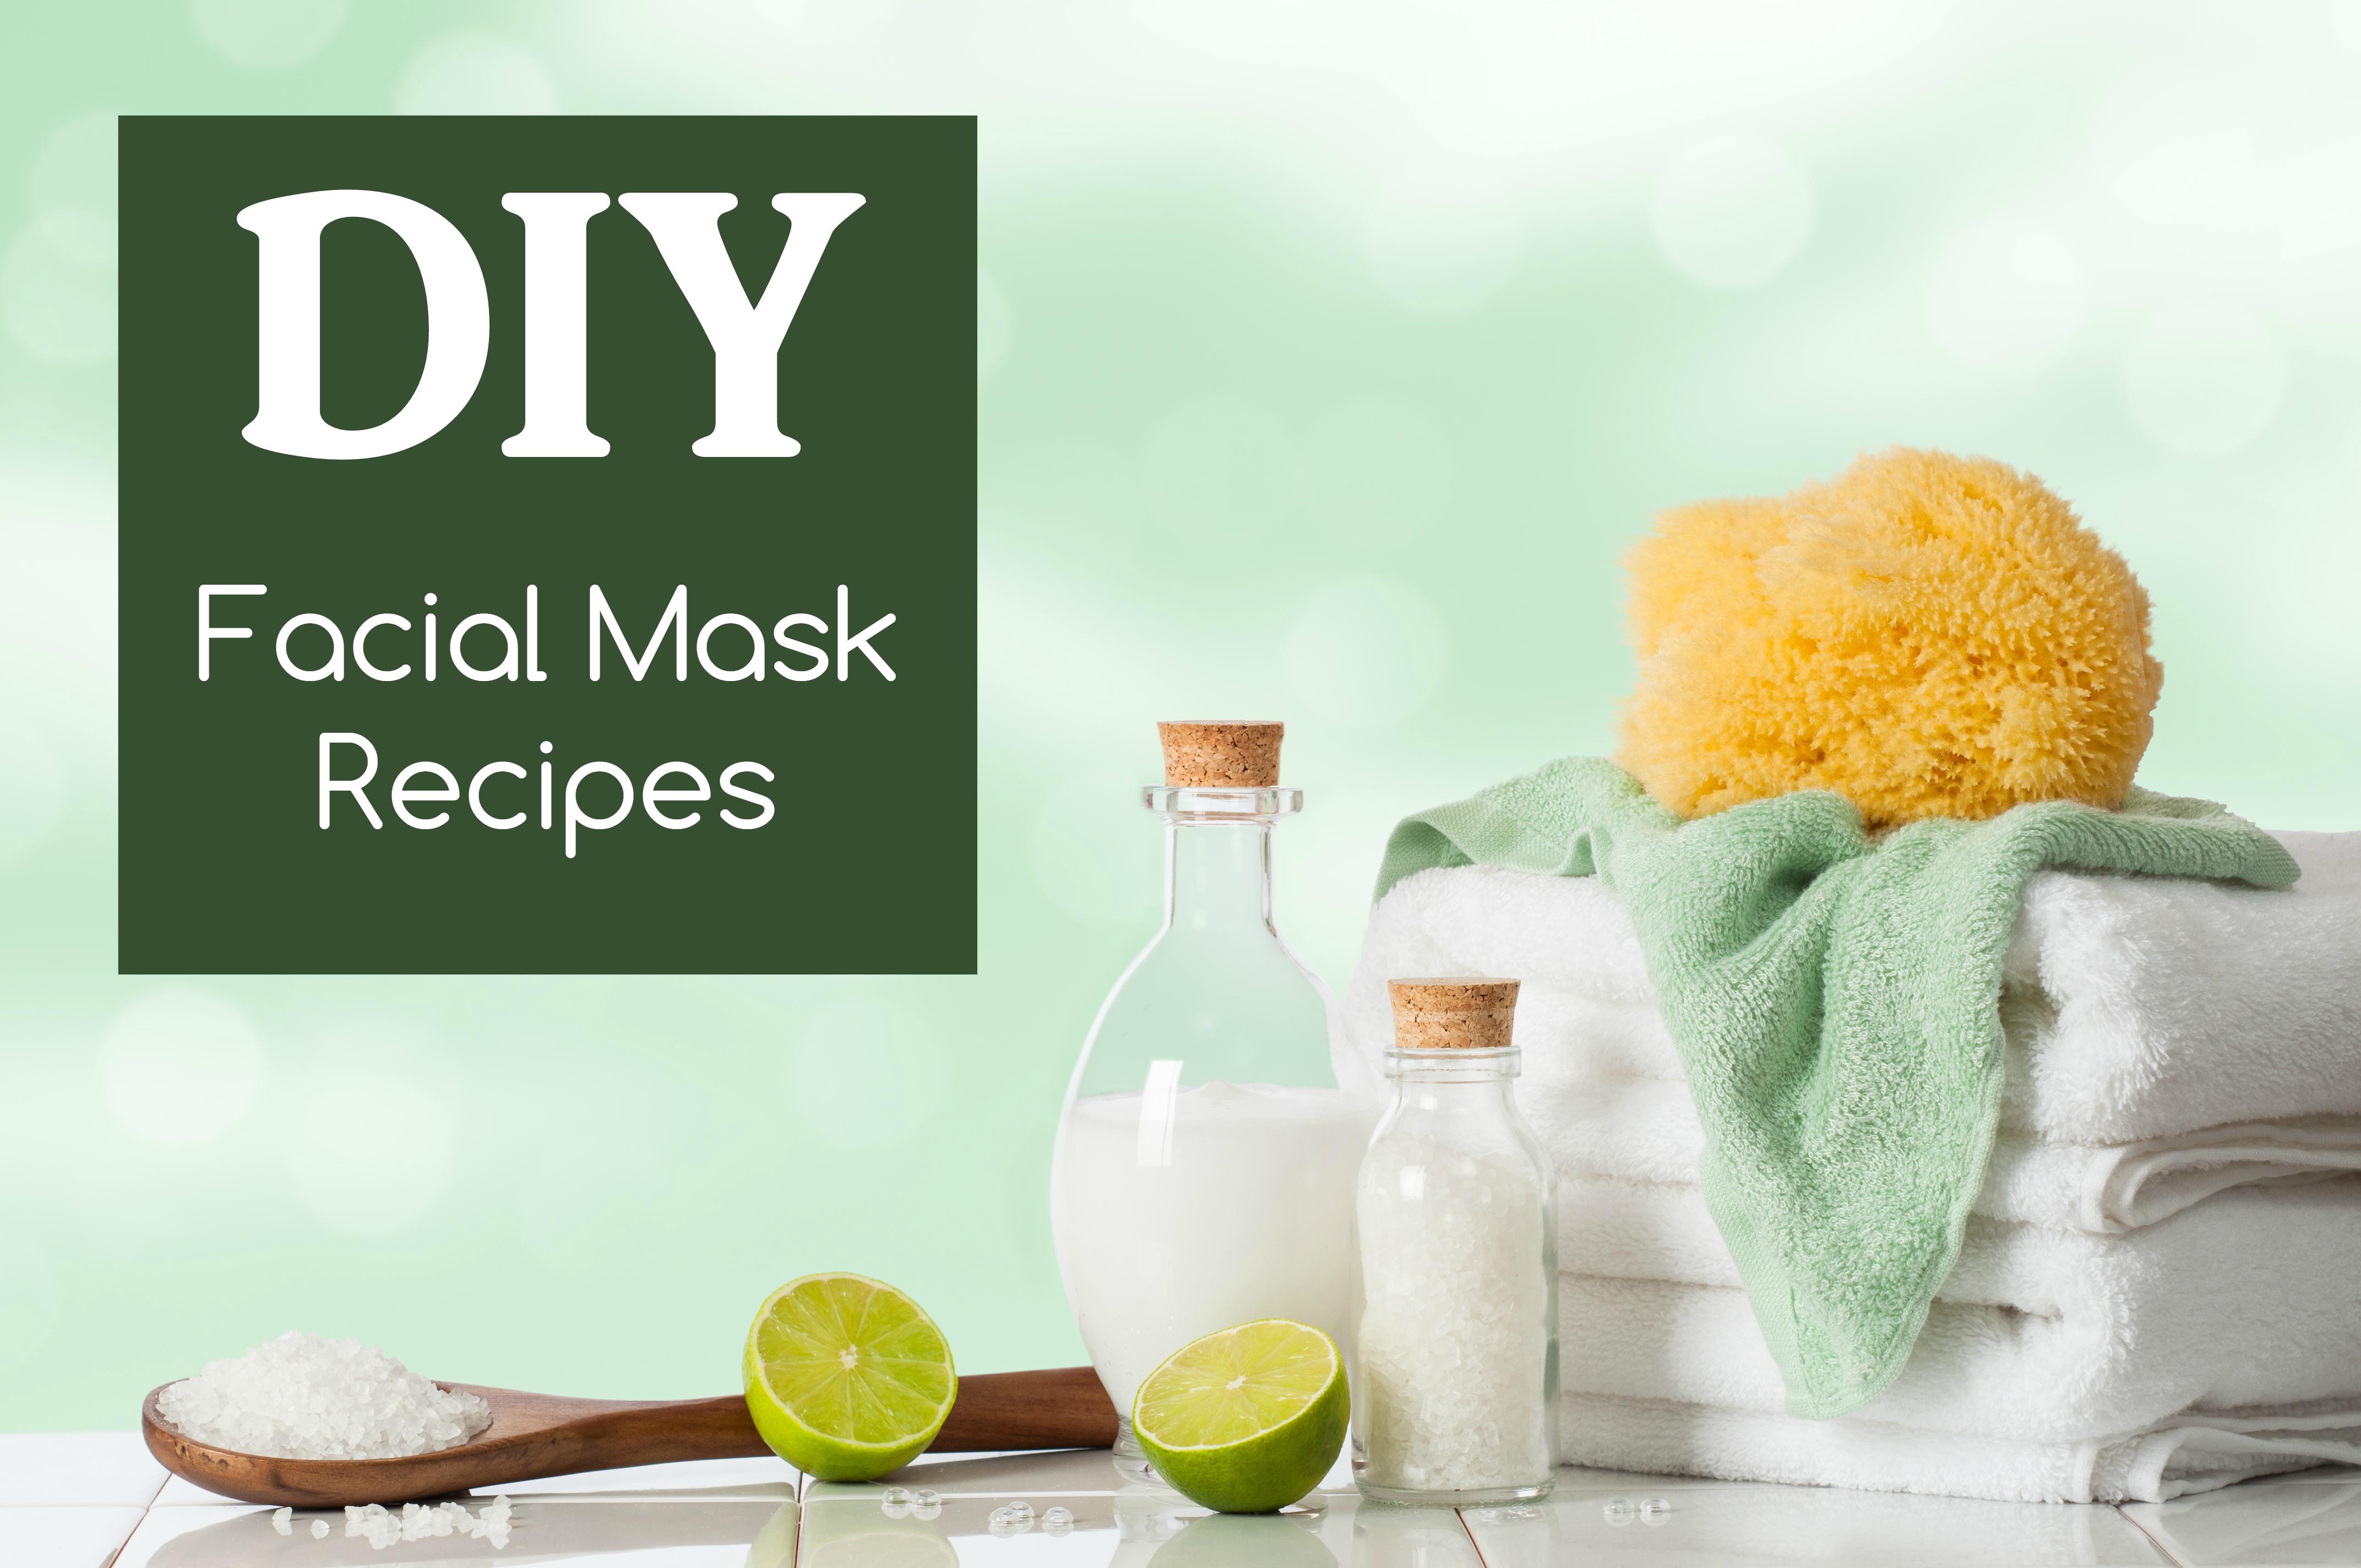 DIY Facial Mask Recipes